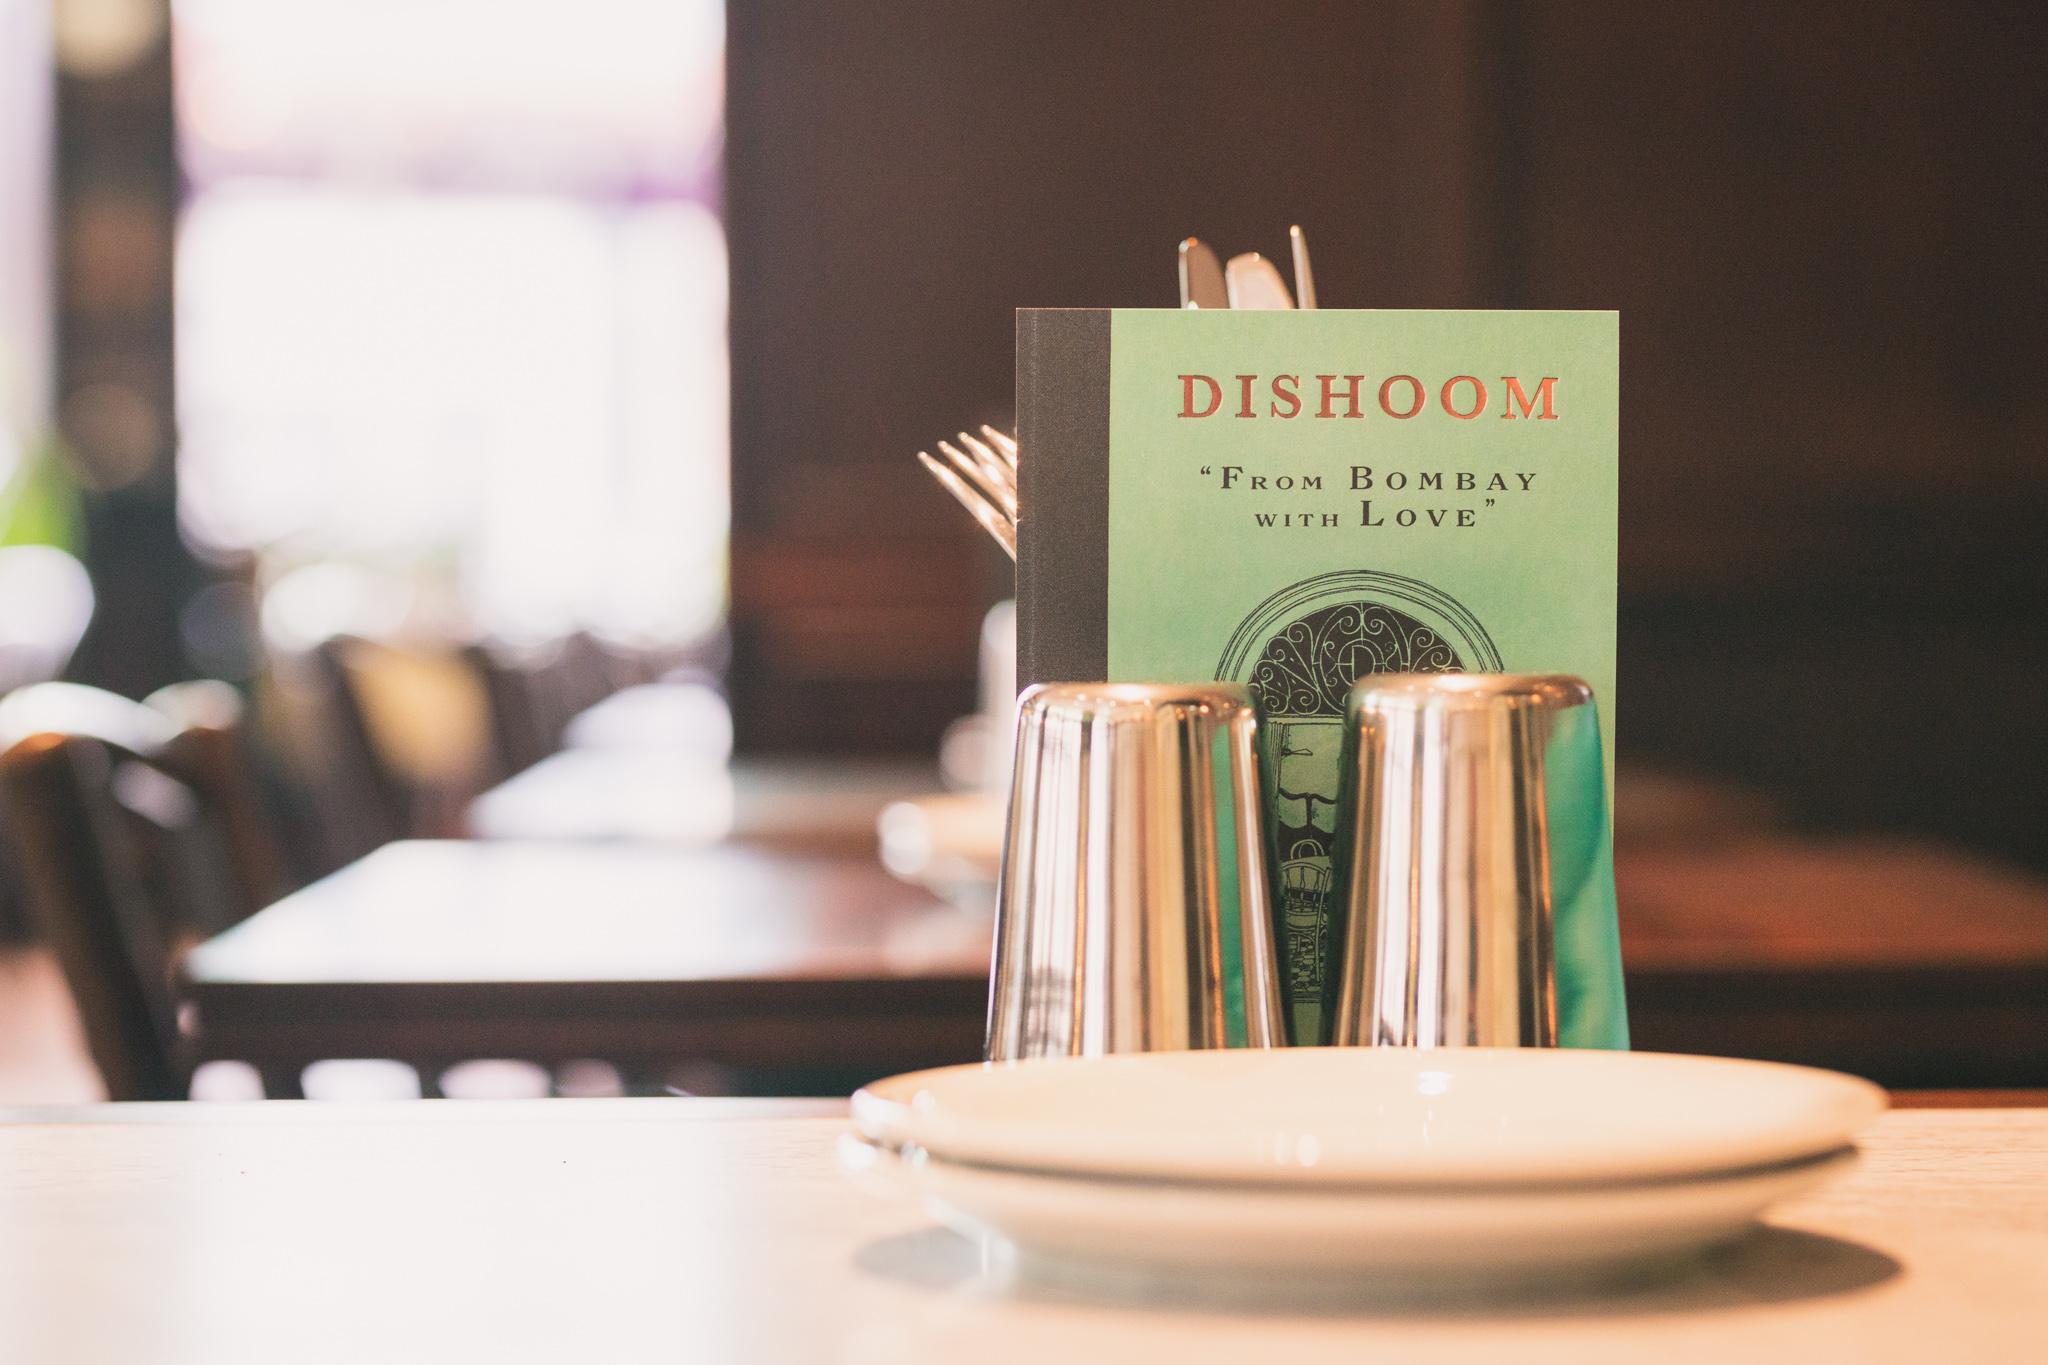 dishoom book